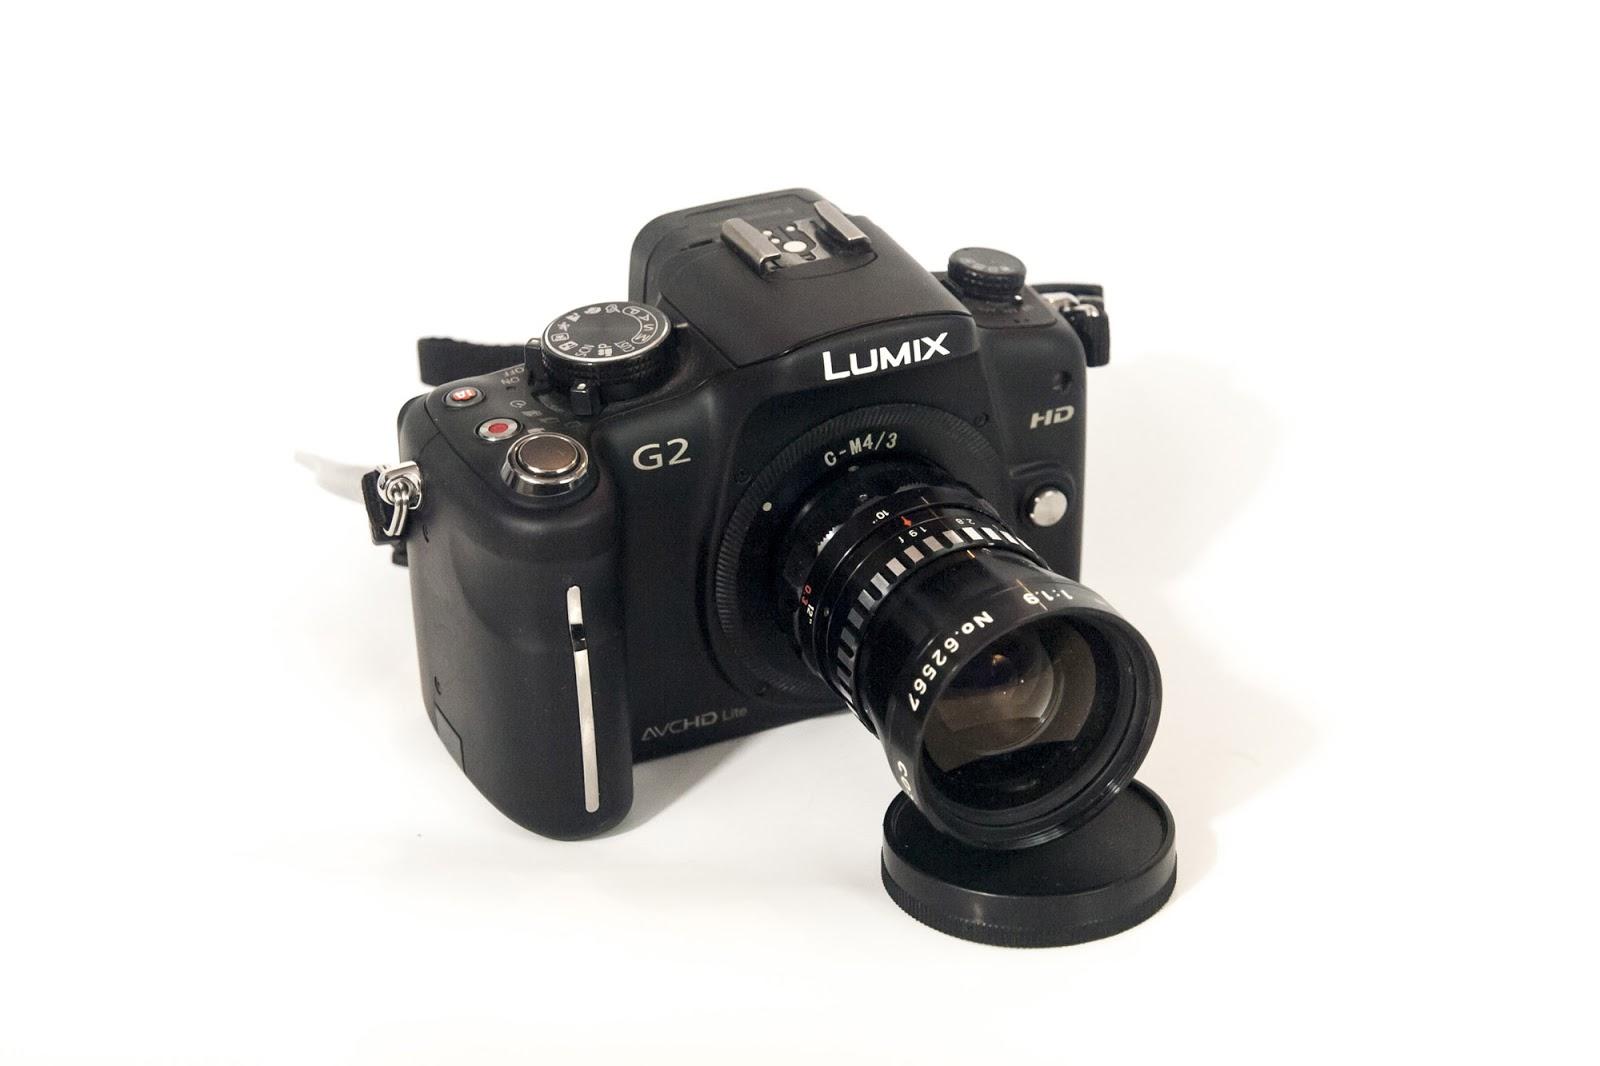 Cosmicar 12.5/1.9 on Lumix G2 (Micro Four Thirds camera).